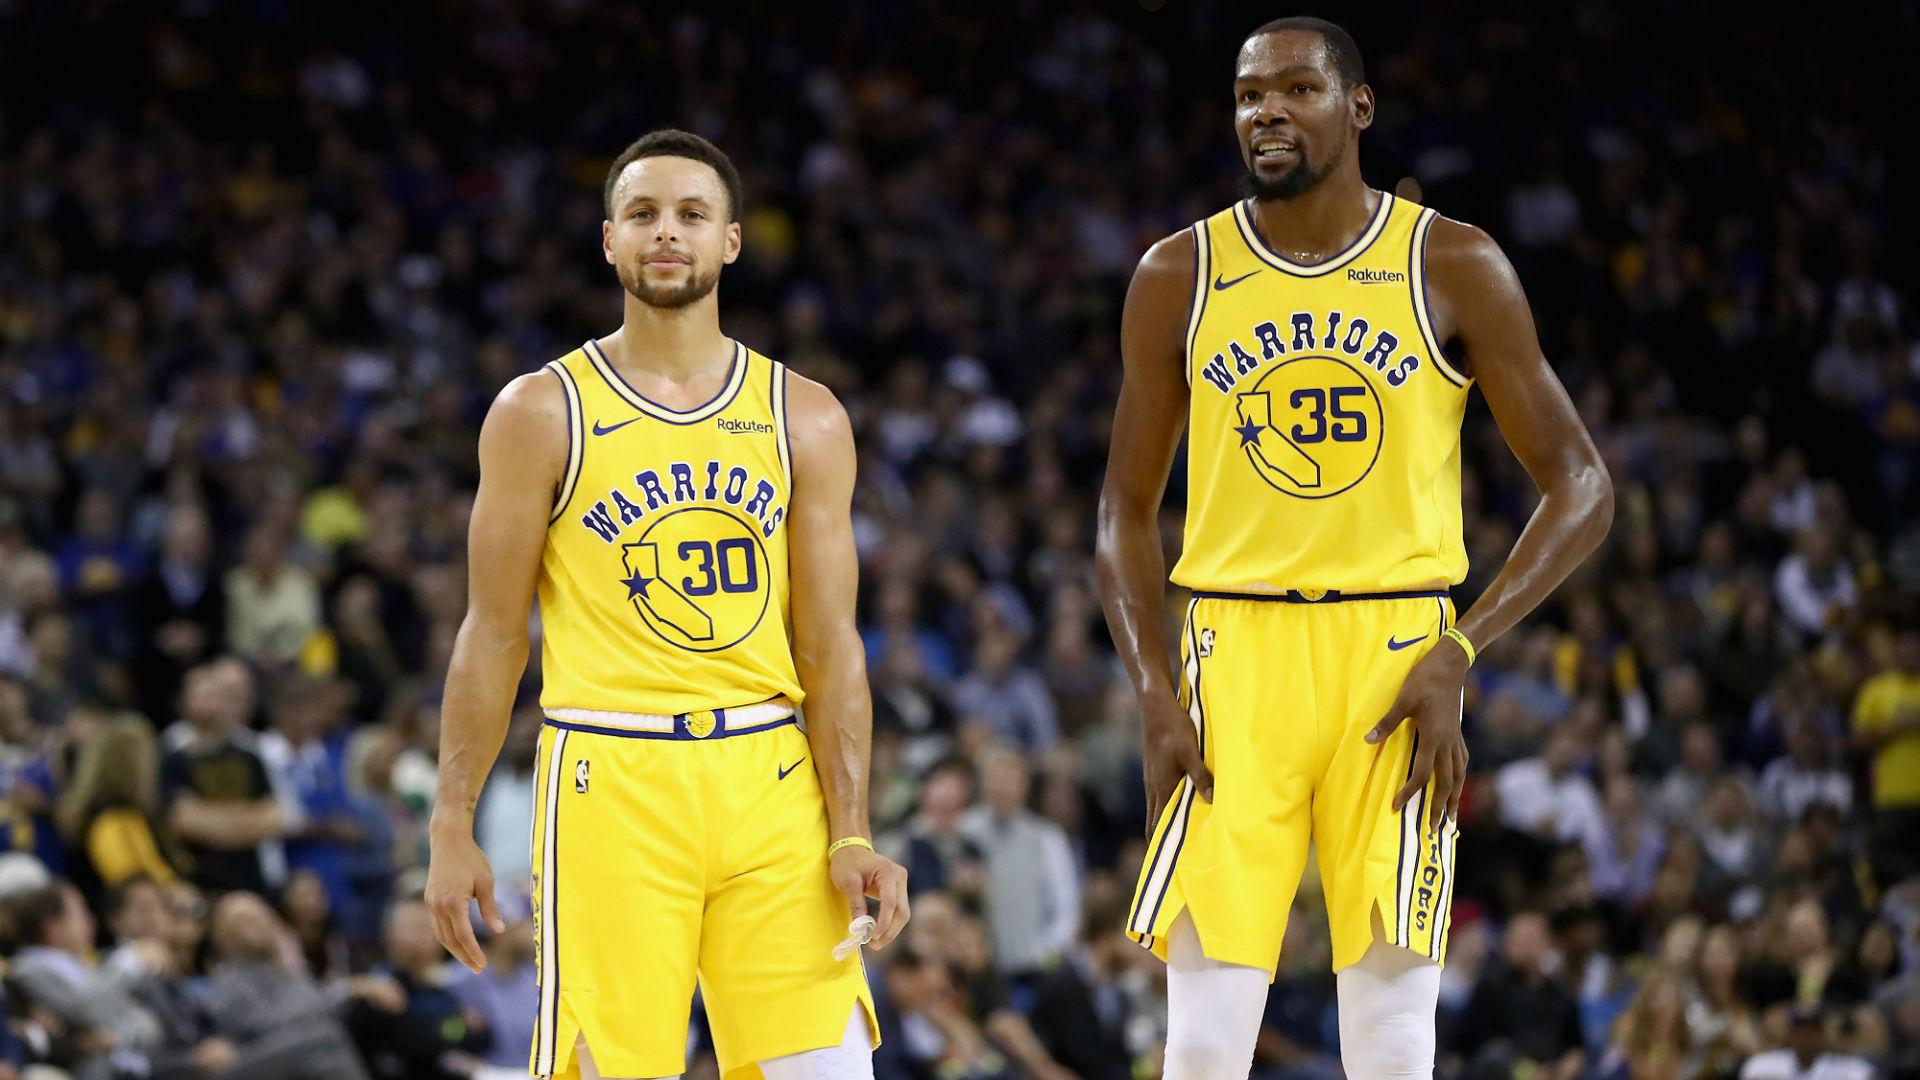 Curry-Stephen-Durant-Kevin-USNews-ftr-getty